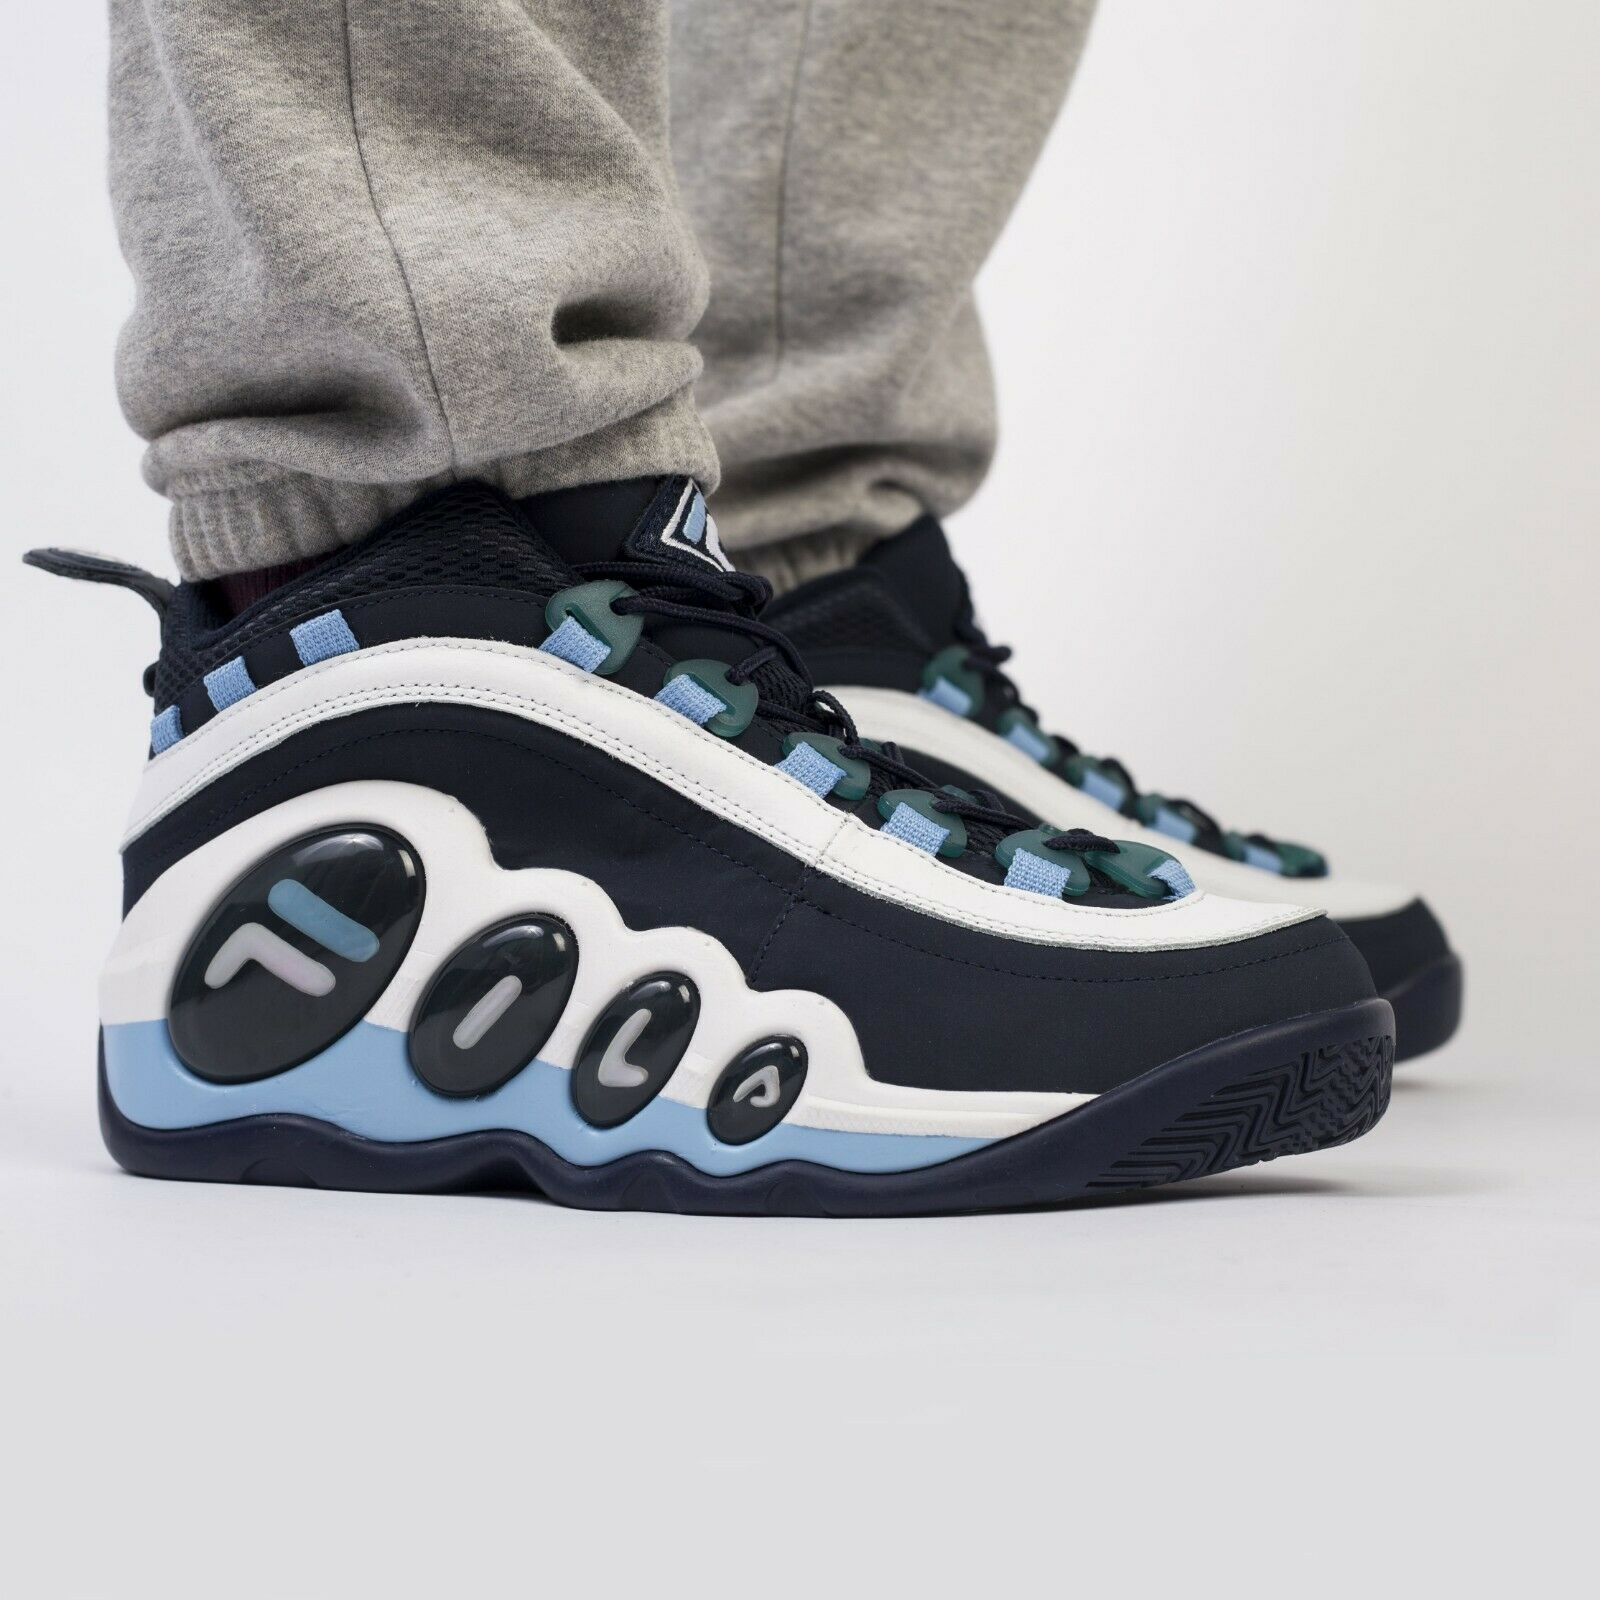 9824ed18d84 Sneakers for men FILA - - - Bubbles Navy White 2eaddb - natxo67.com